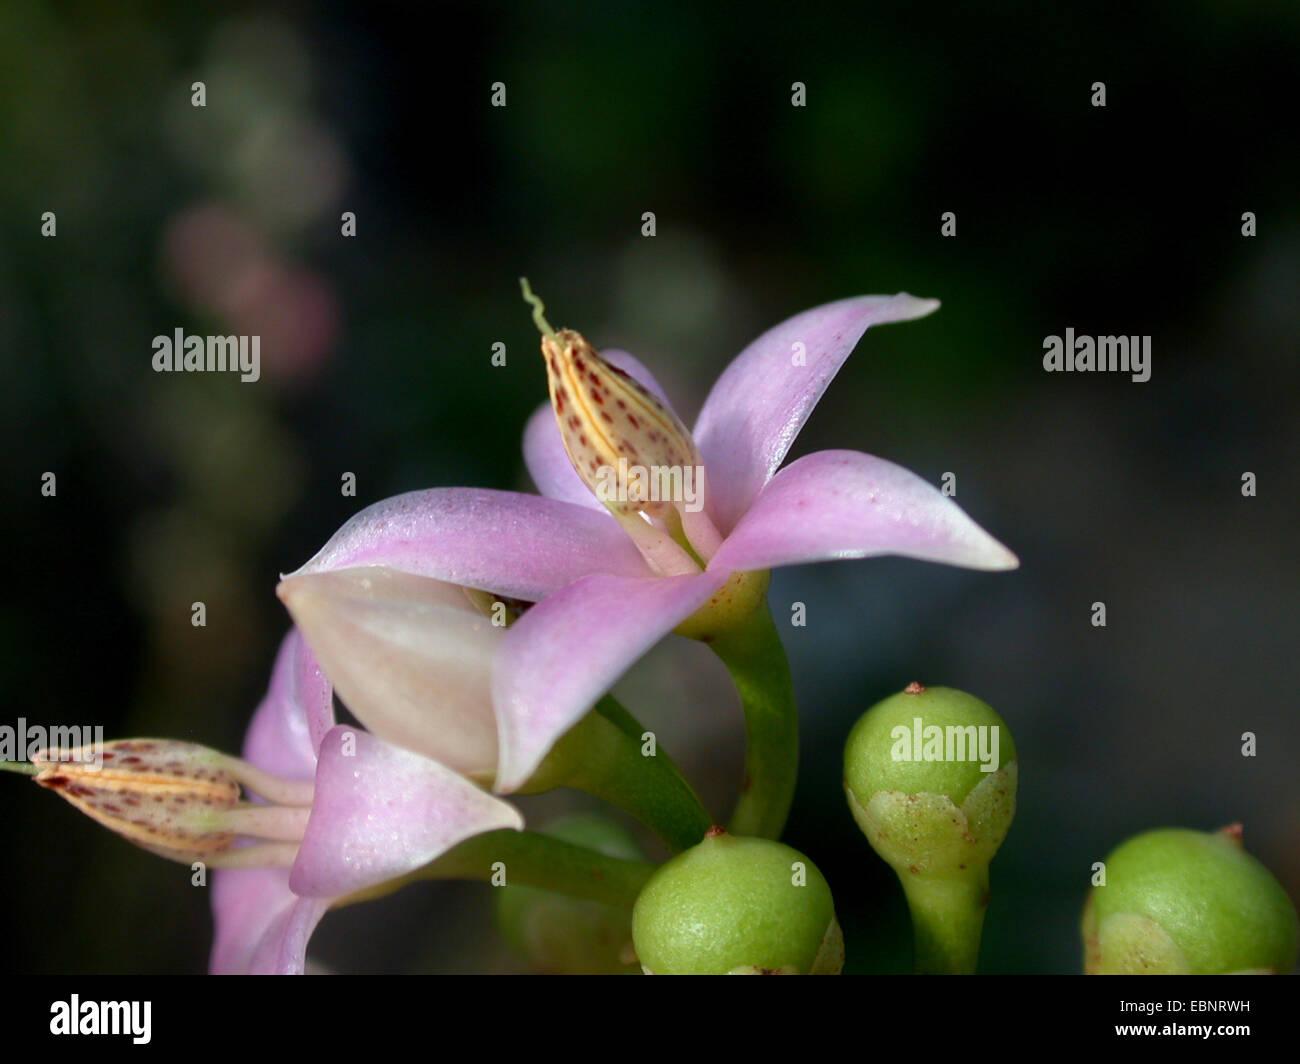 Grewia (Grewia floribunda), flower - Stock Image